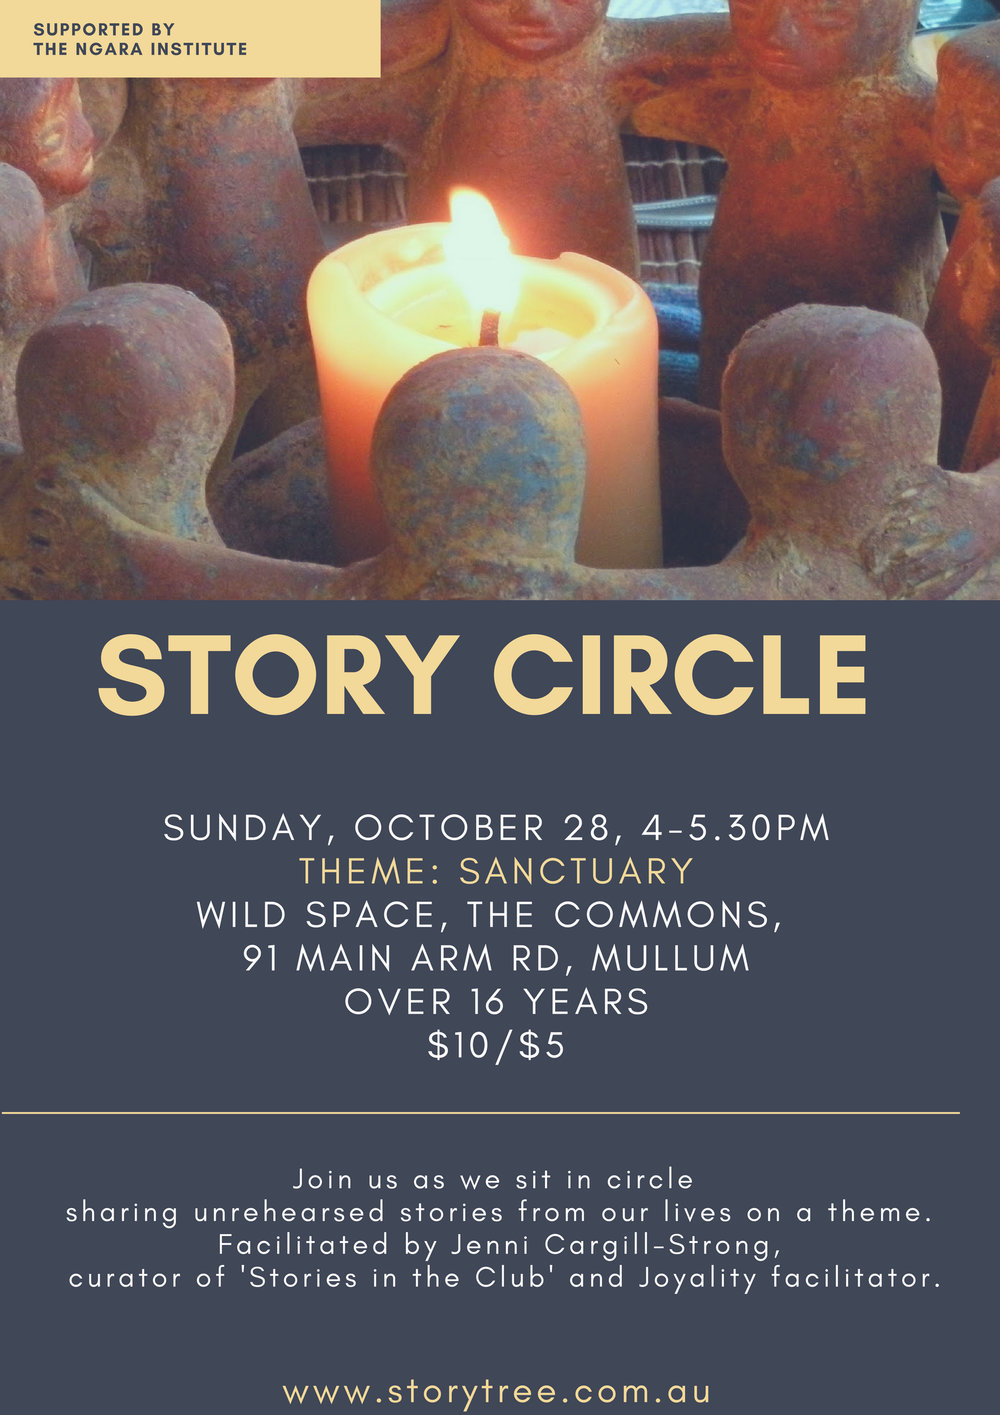 story circle poster Oct 28.jpg